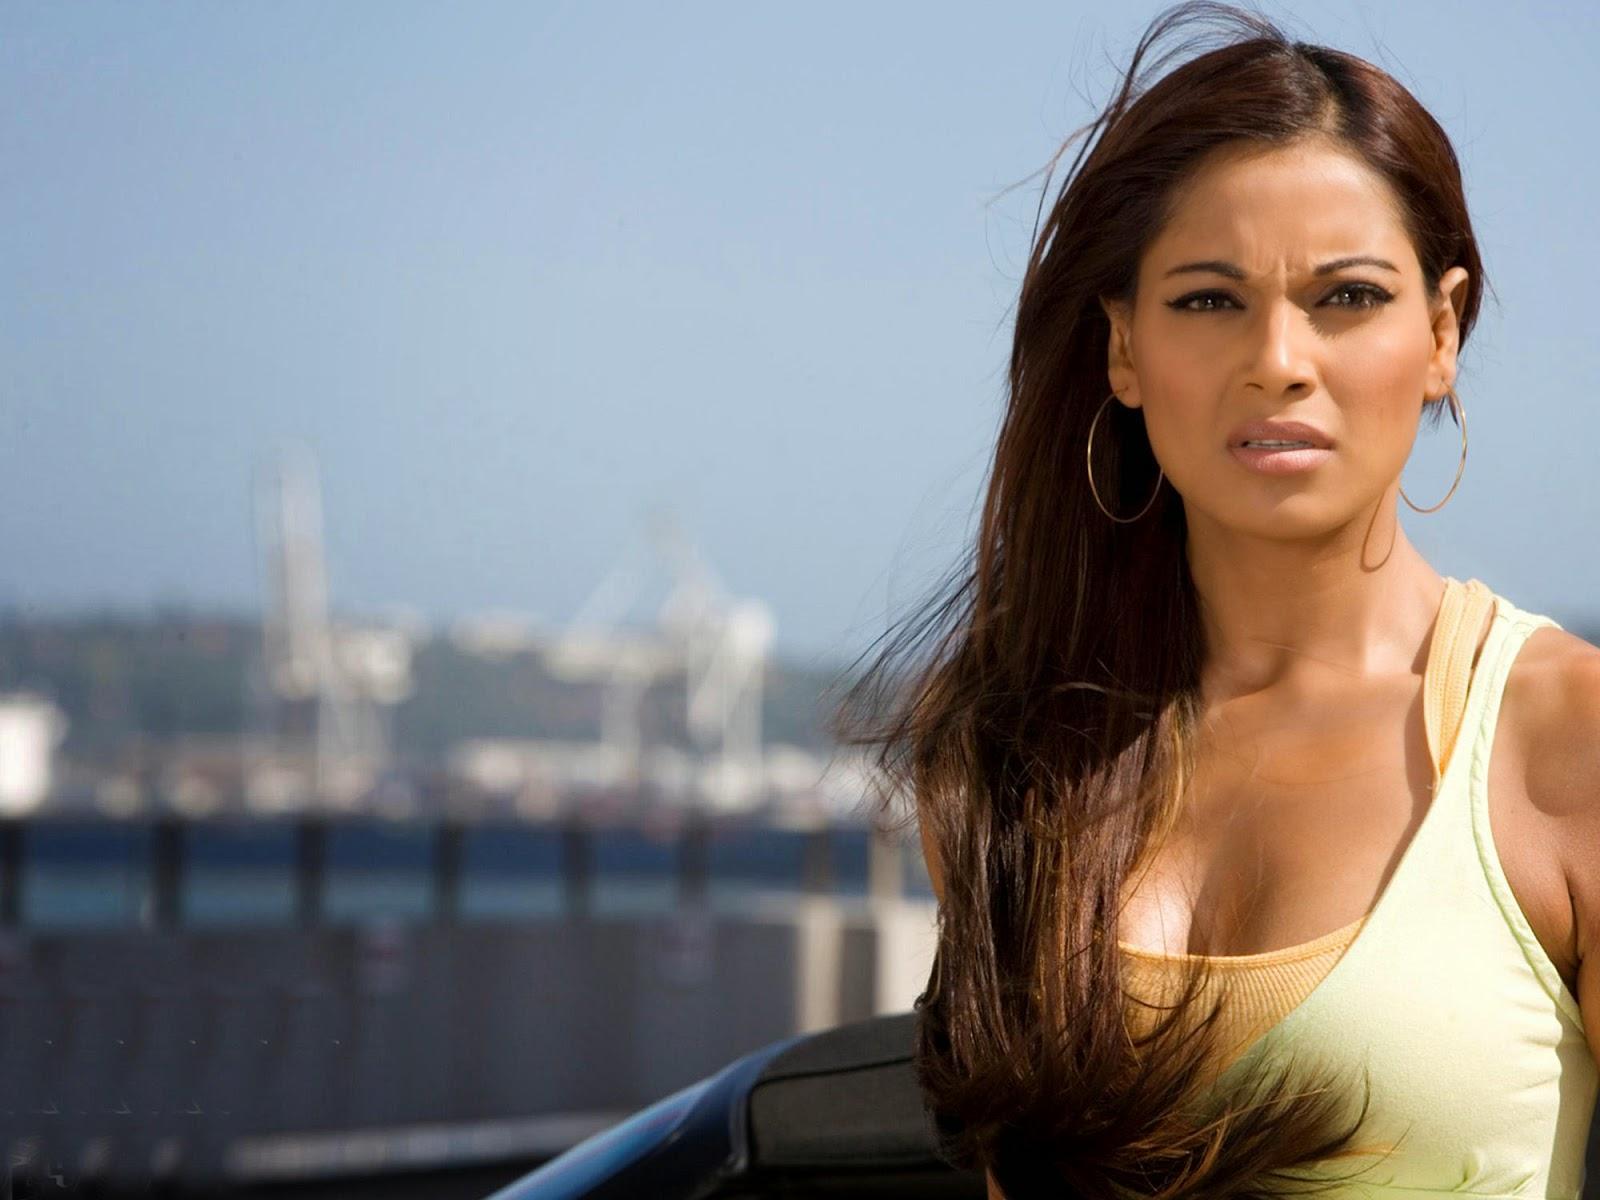 bollywood actress full hd wallpaper bipasha basu hot photos, full hd